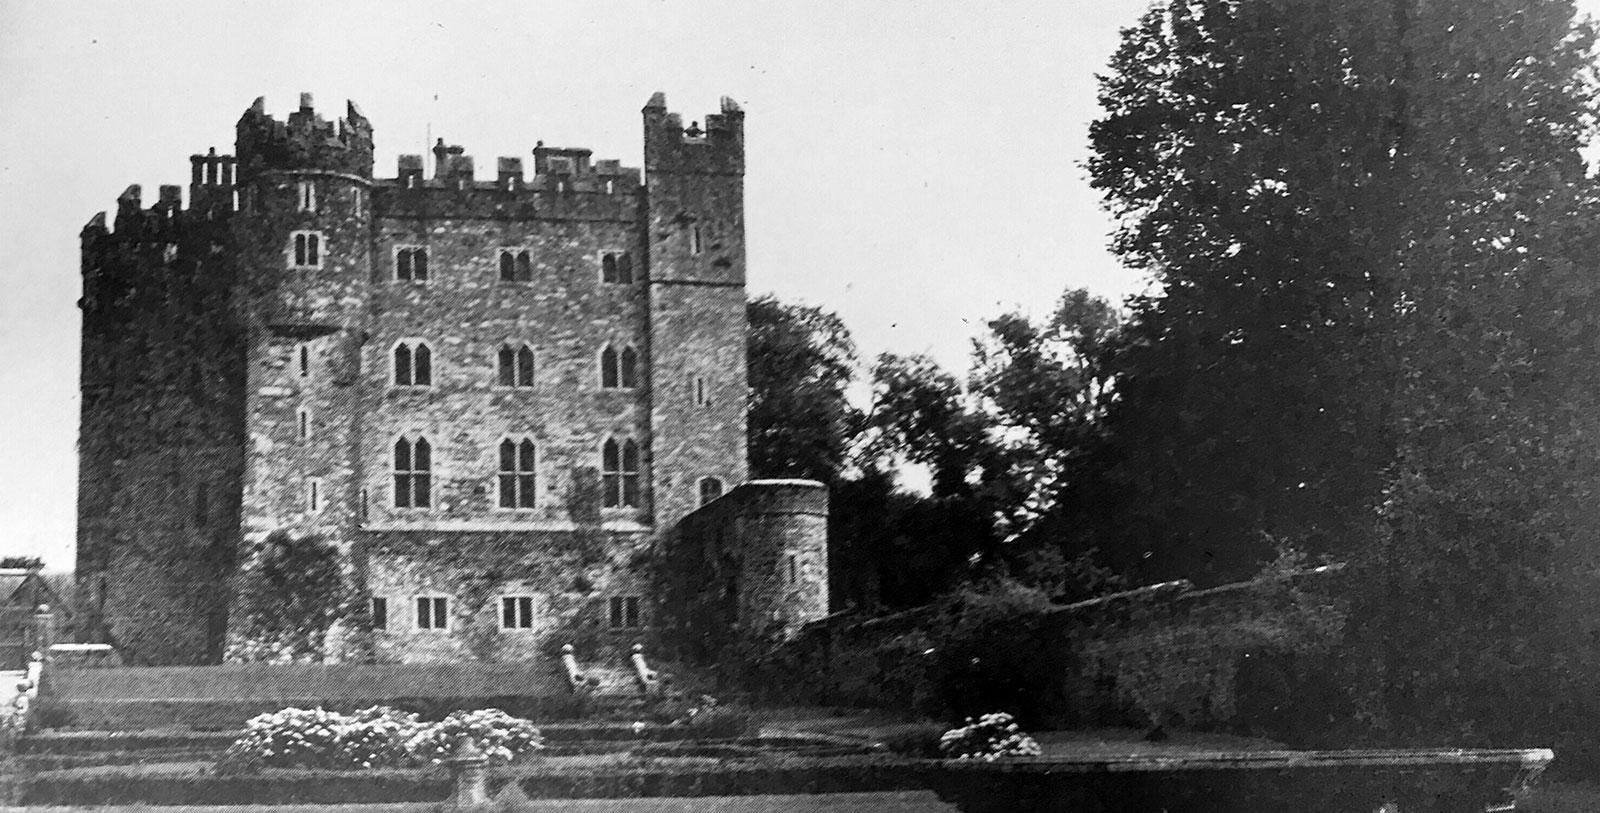 Historical Image of Castle Garden Kilkea Castle Estate and Golf Club Castledermont County Kildare Ireland, History